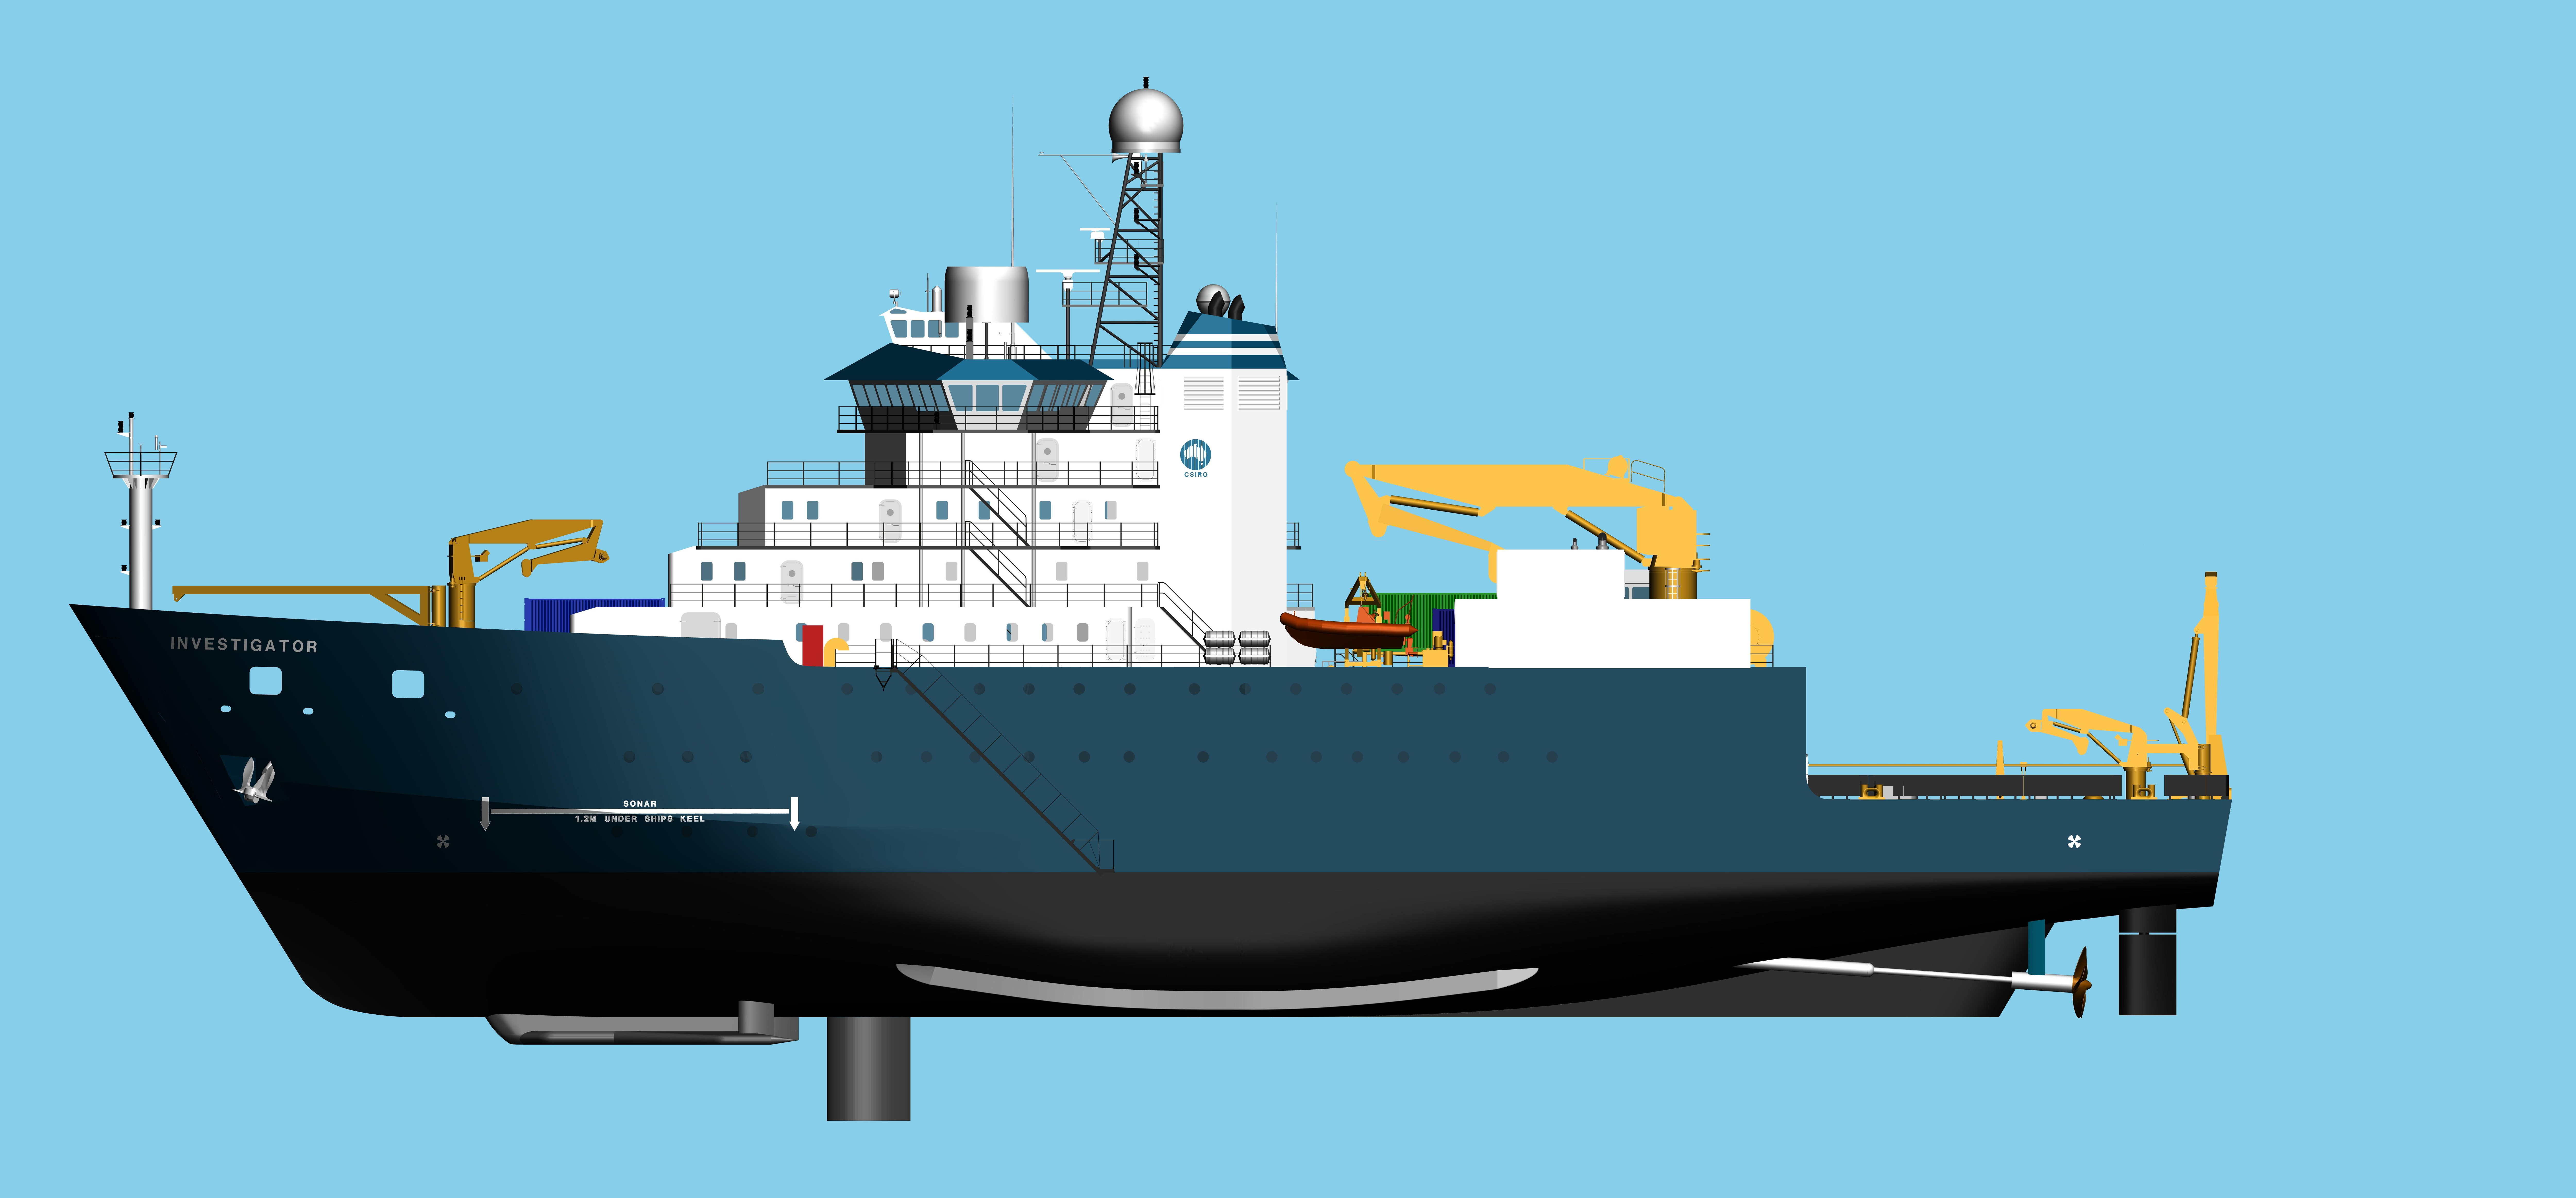 Investigator graphic - starboard view